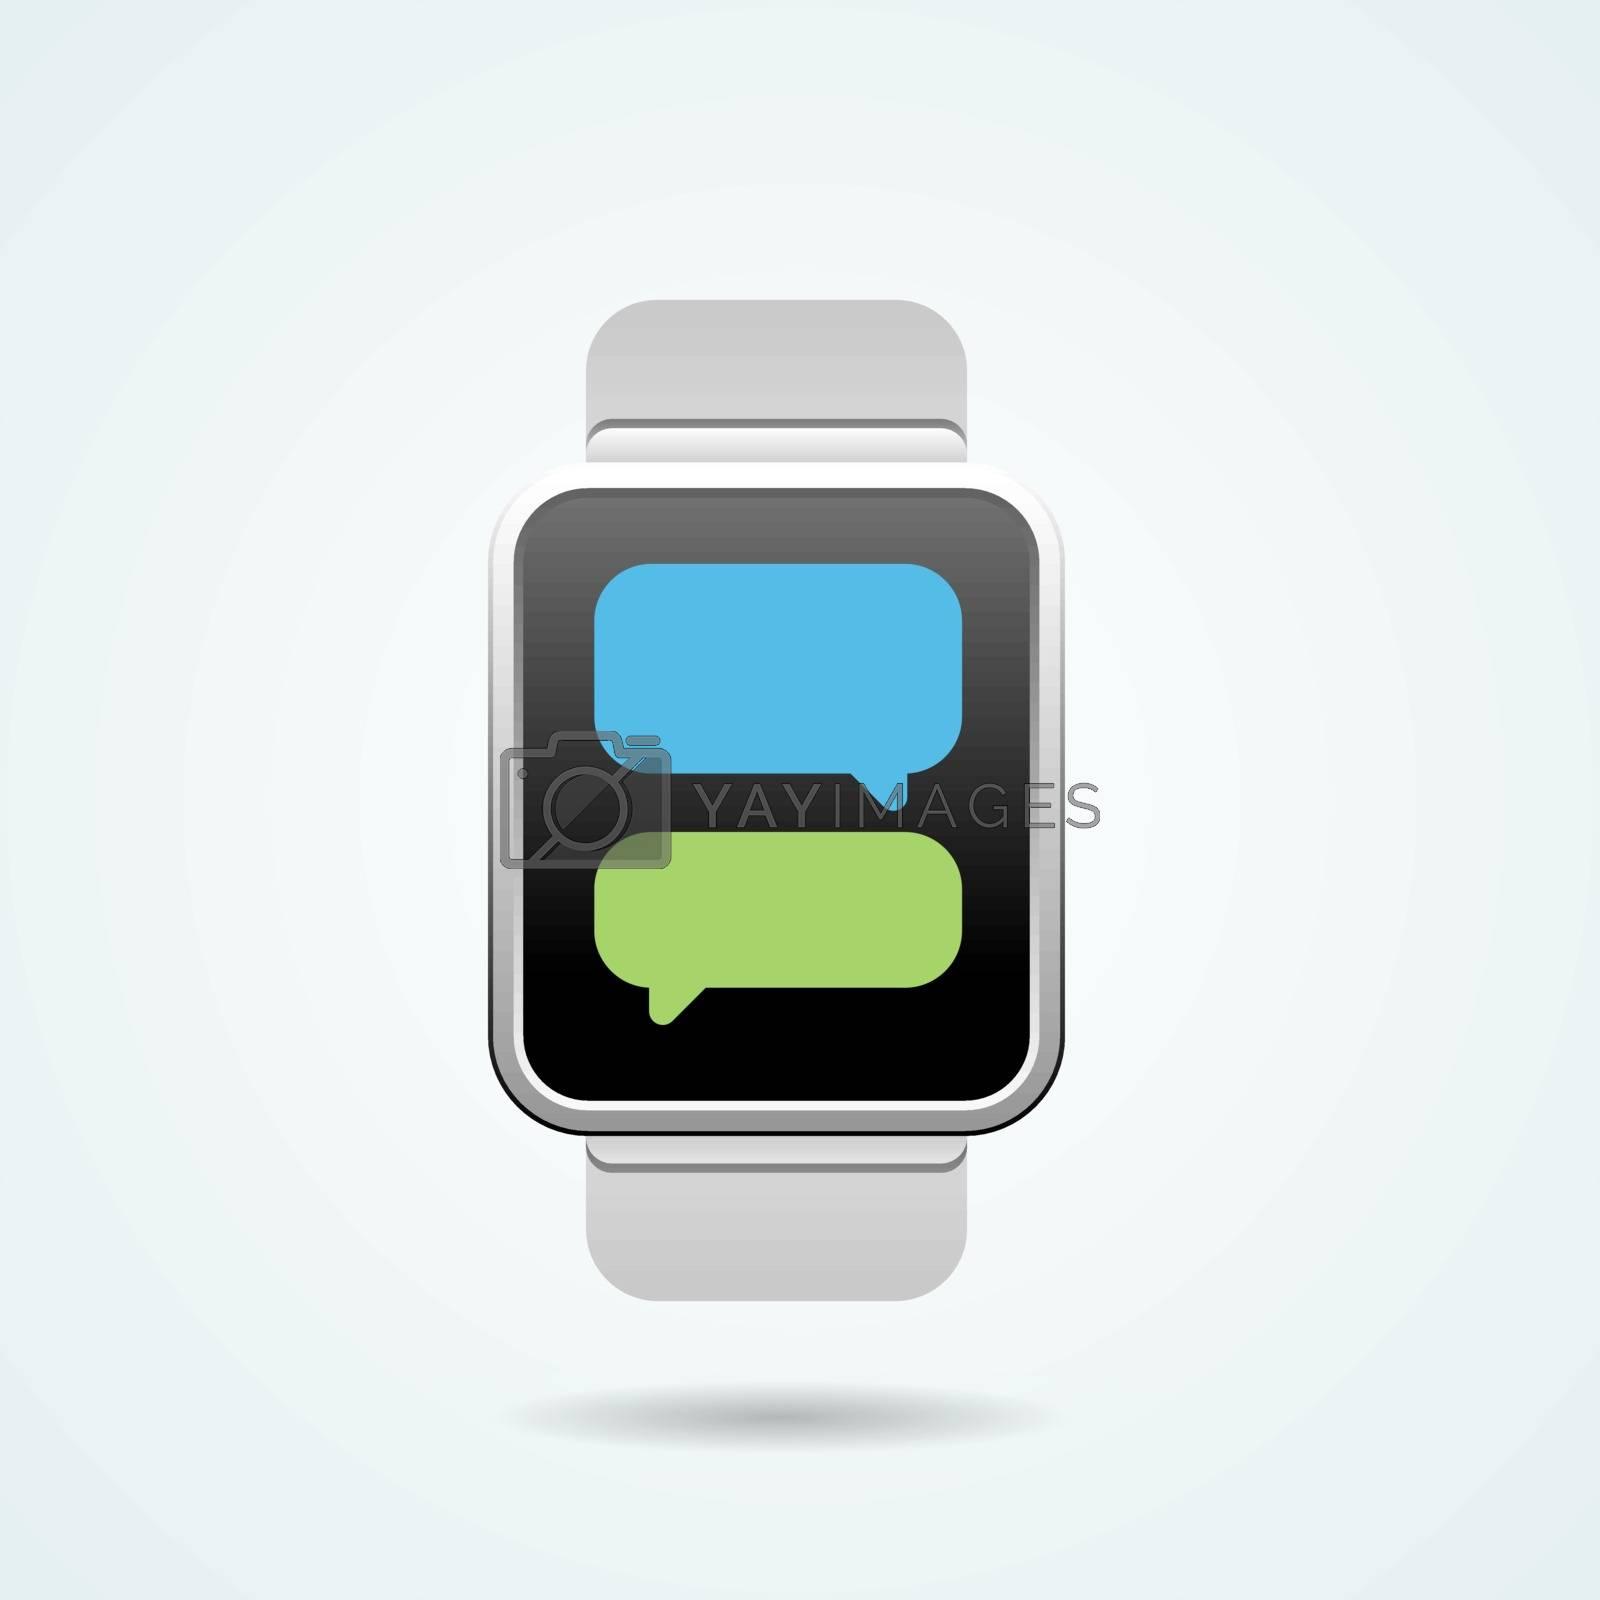 Smart Watch Illustration in Vector